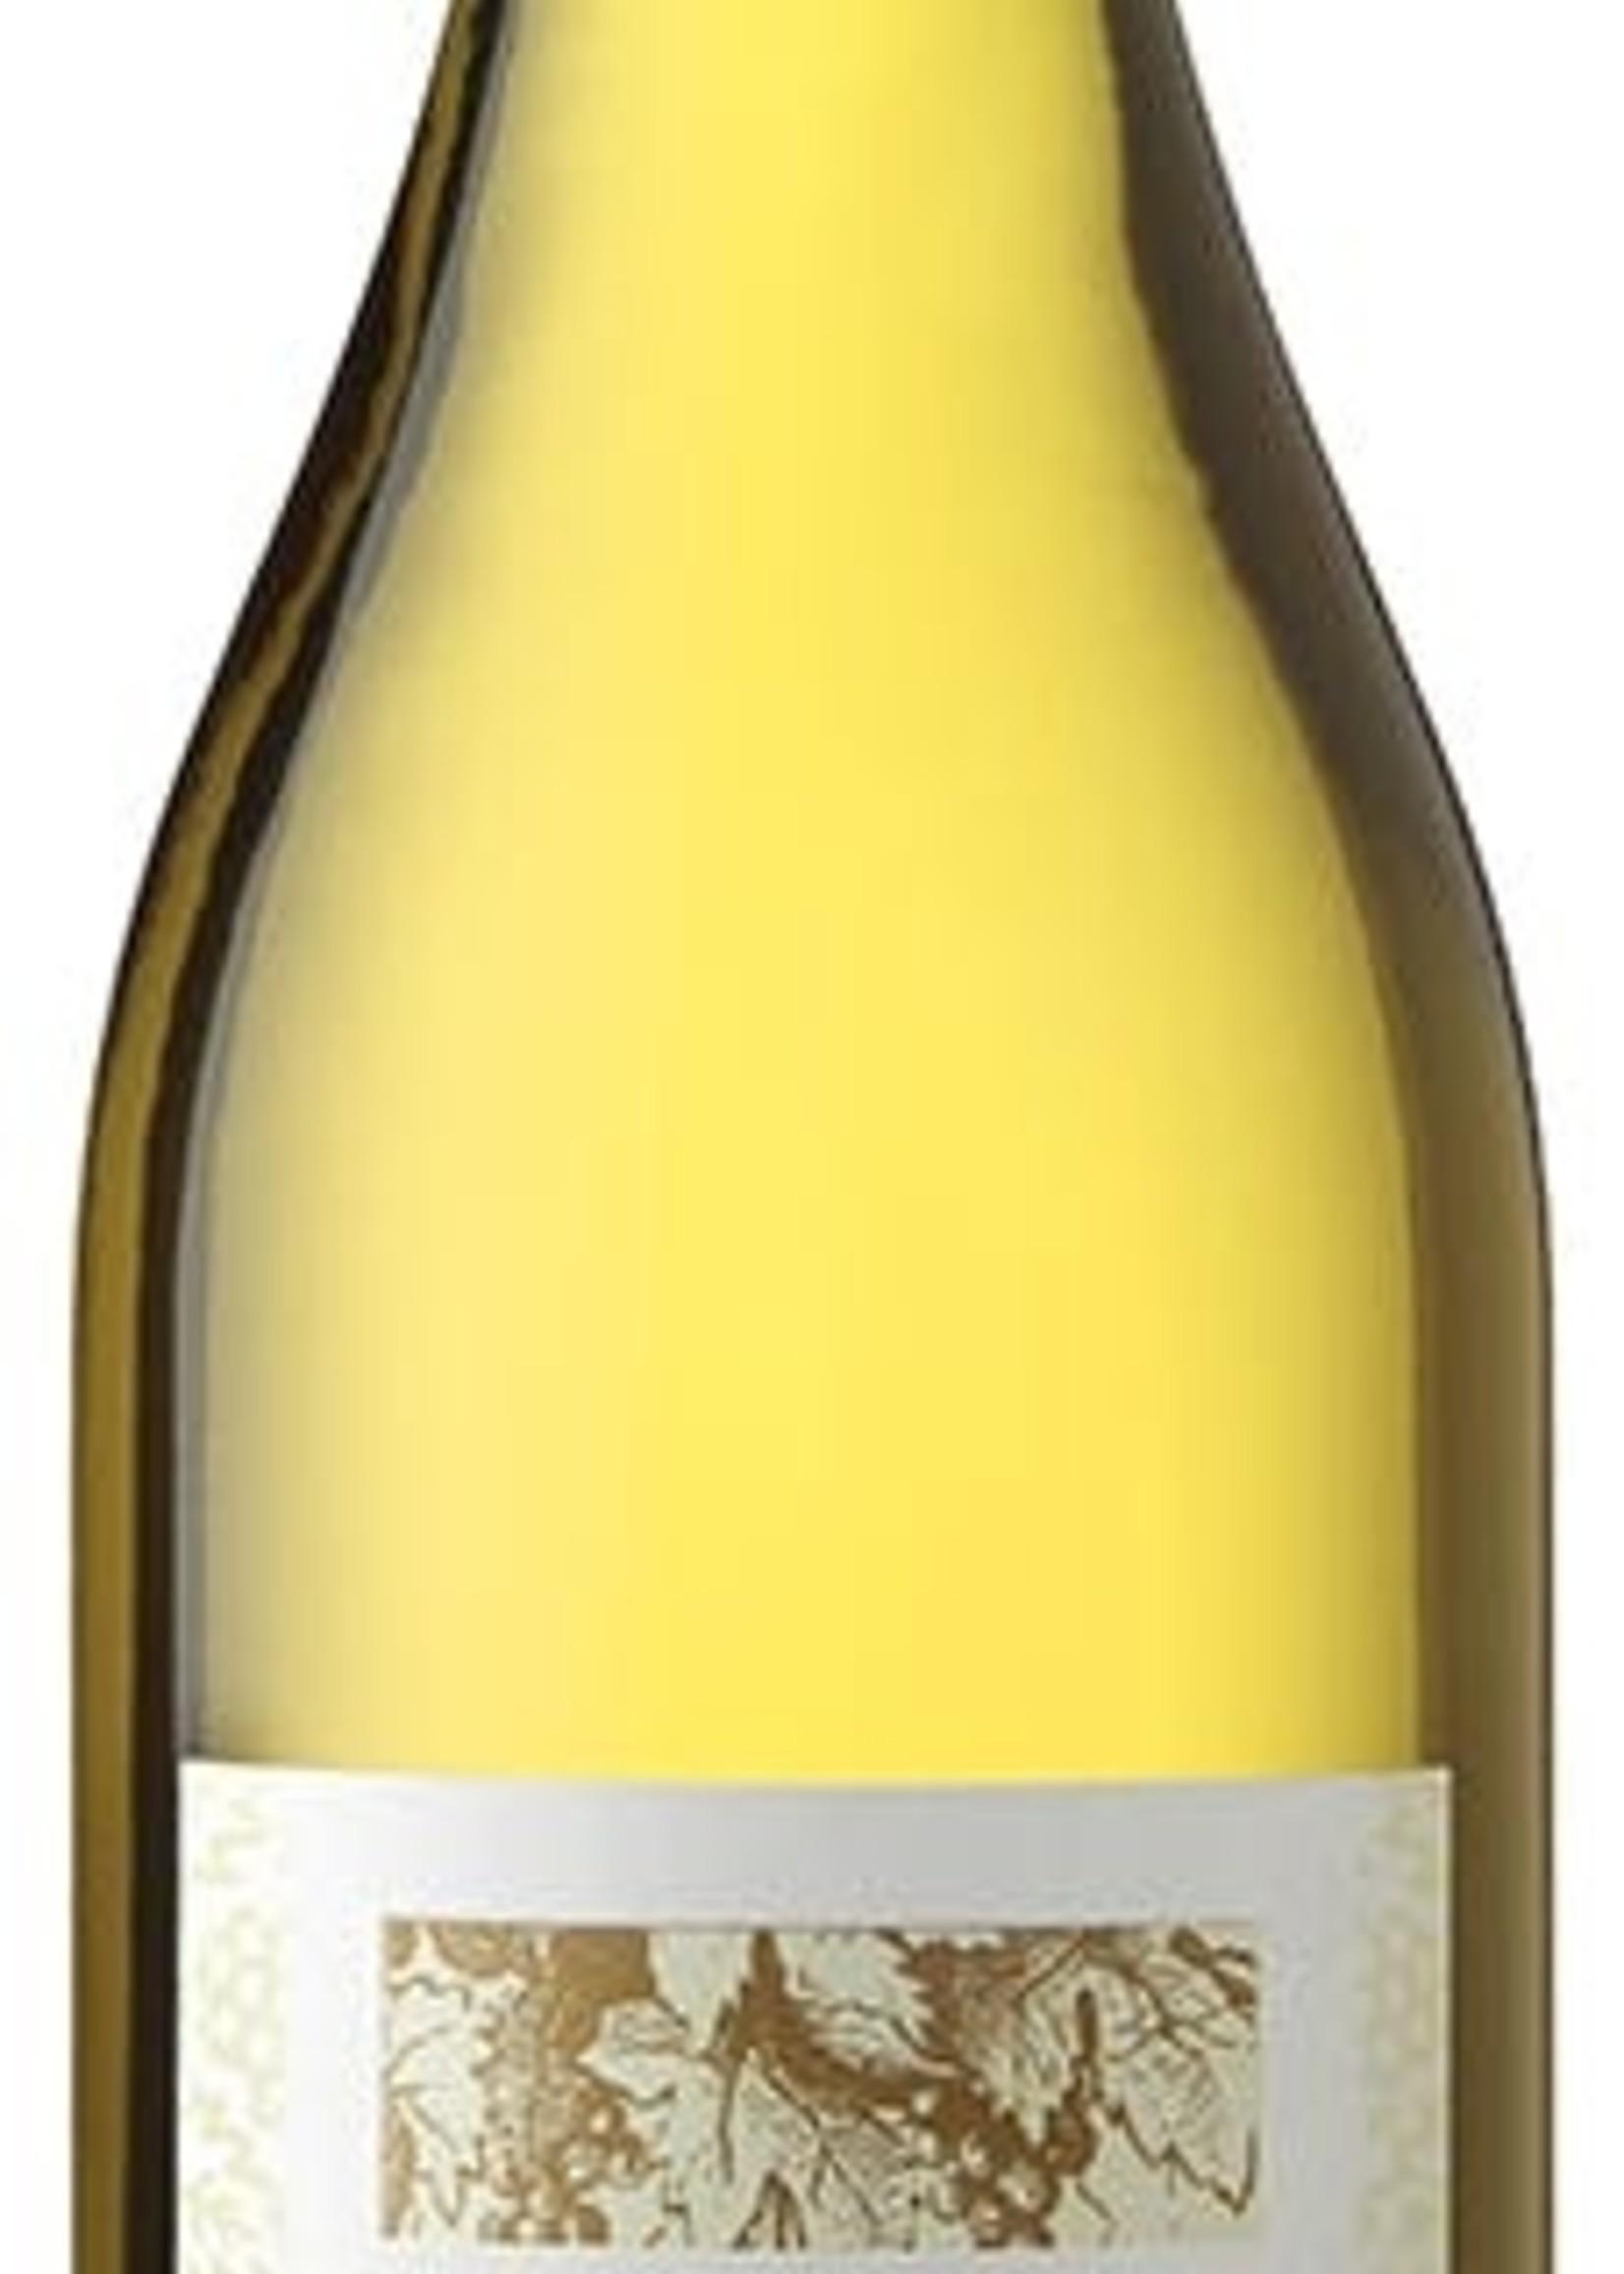 Dreyer Sonoma Chardonnay